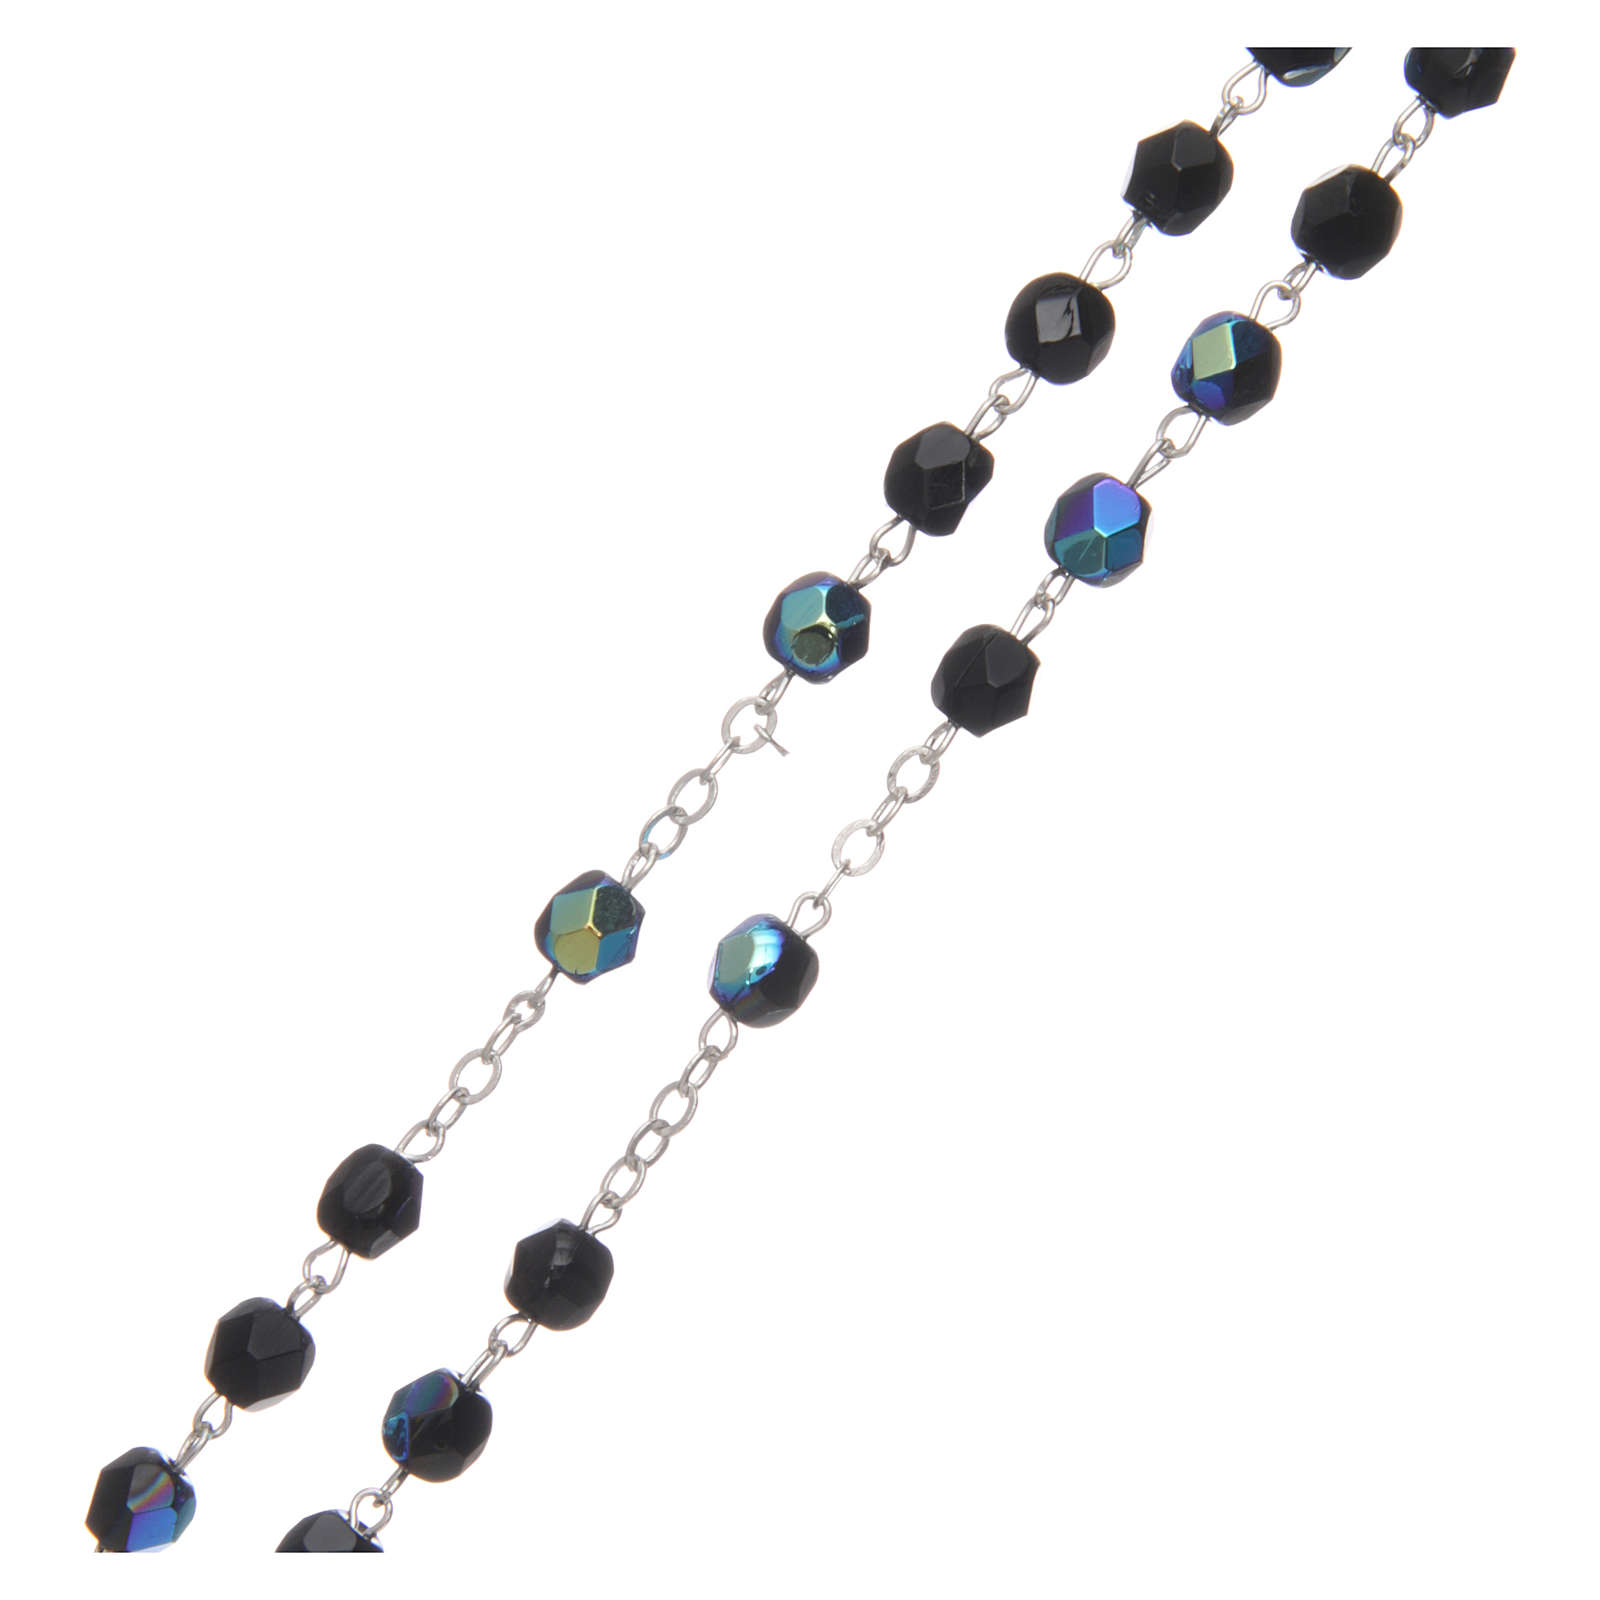 Chapelet semi-cristal 2 mm noir iridescent 4